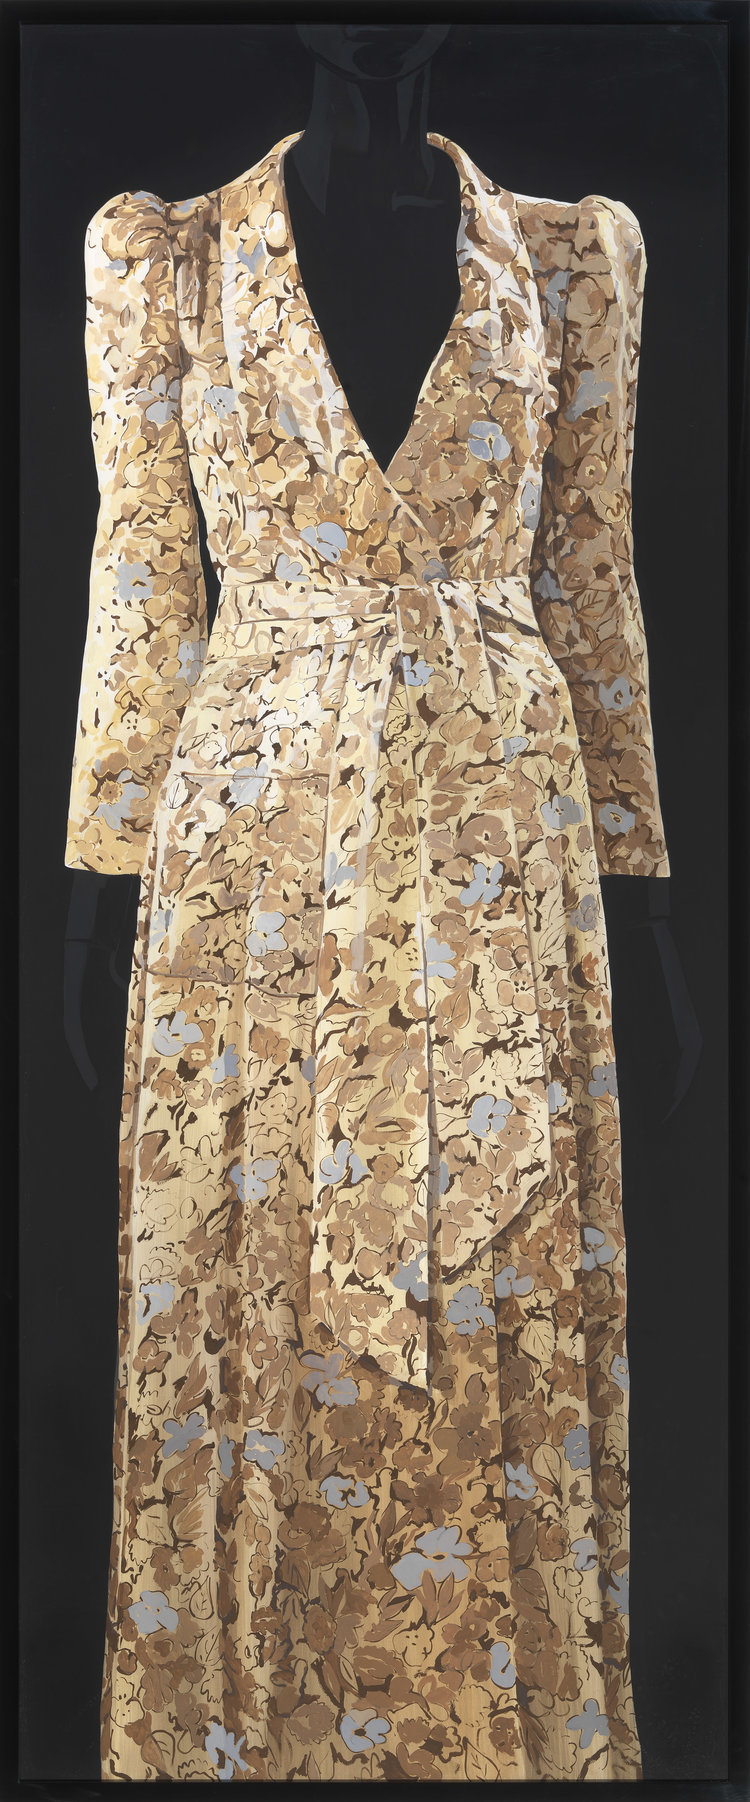 'Crepe Kimono. Style dress with Deco print. Biba', 2014, ett konstverk av Paulina Olowska